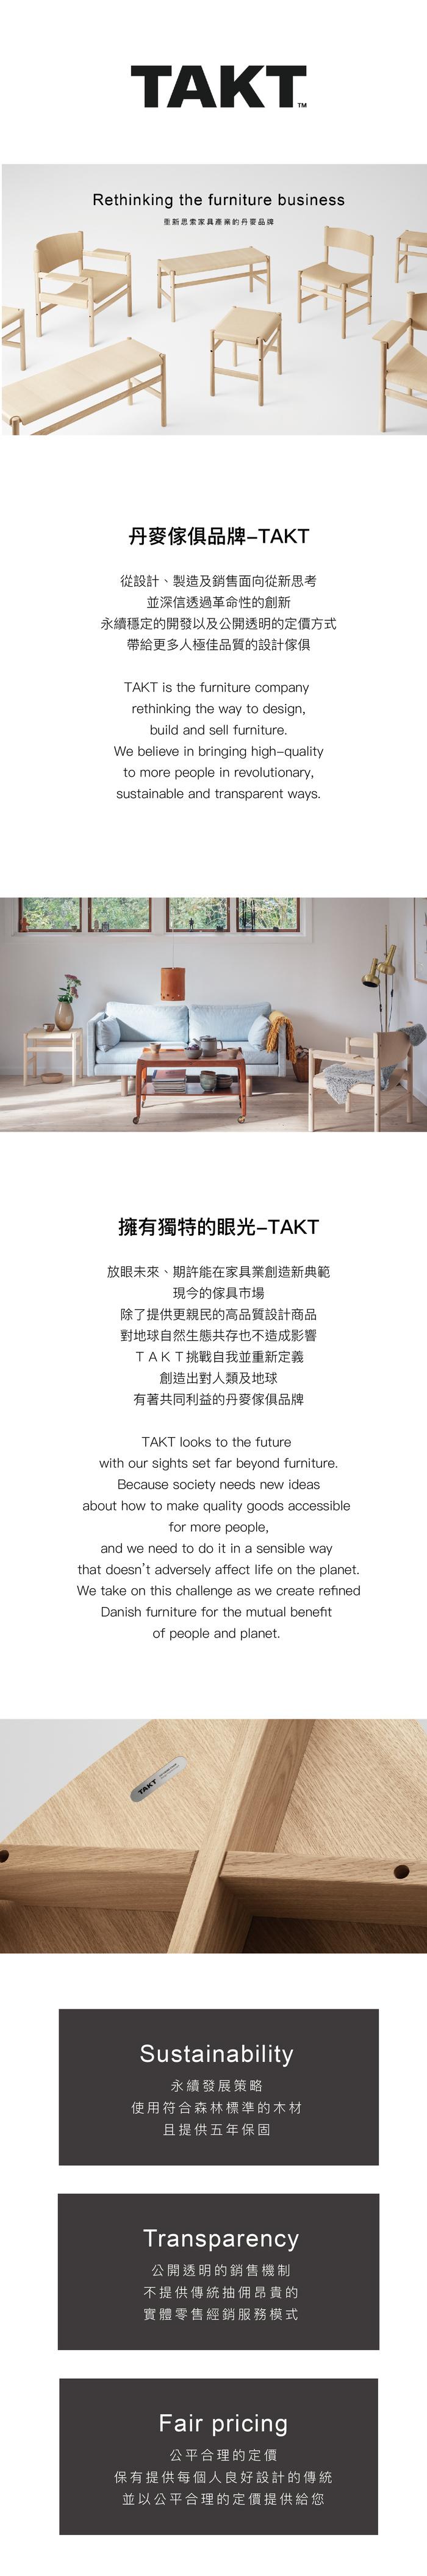 TAKT 丹麥家具品牌-T04 Soft Lounge chair 環保梣木休閒椅